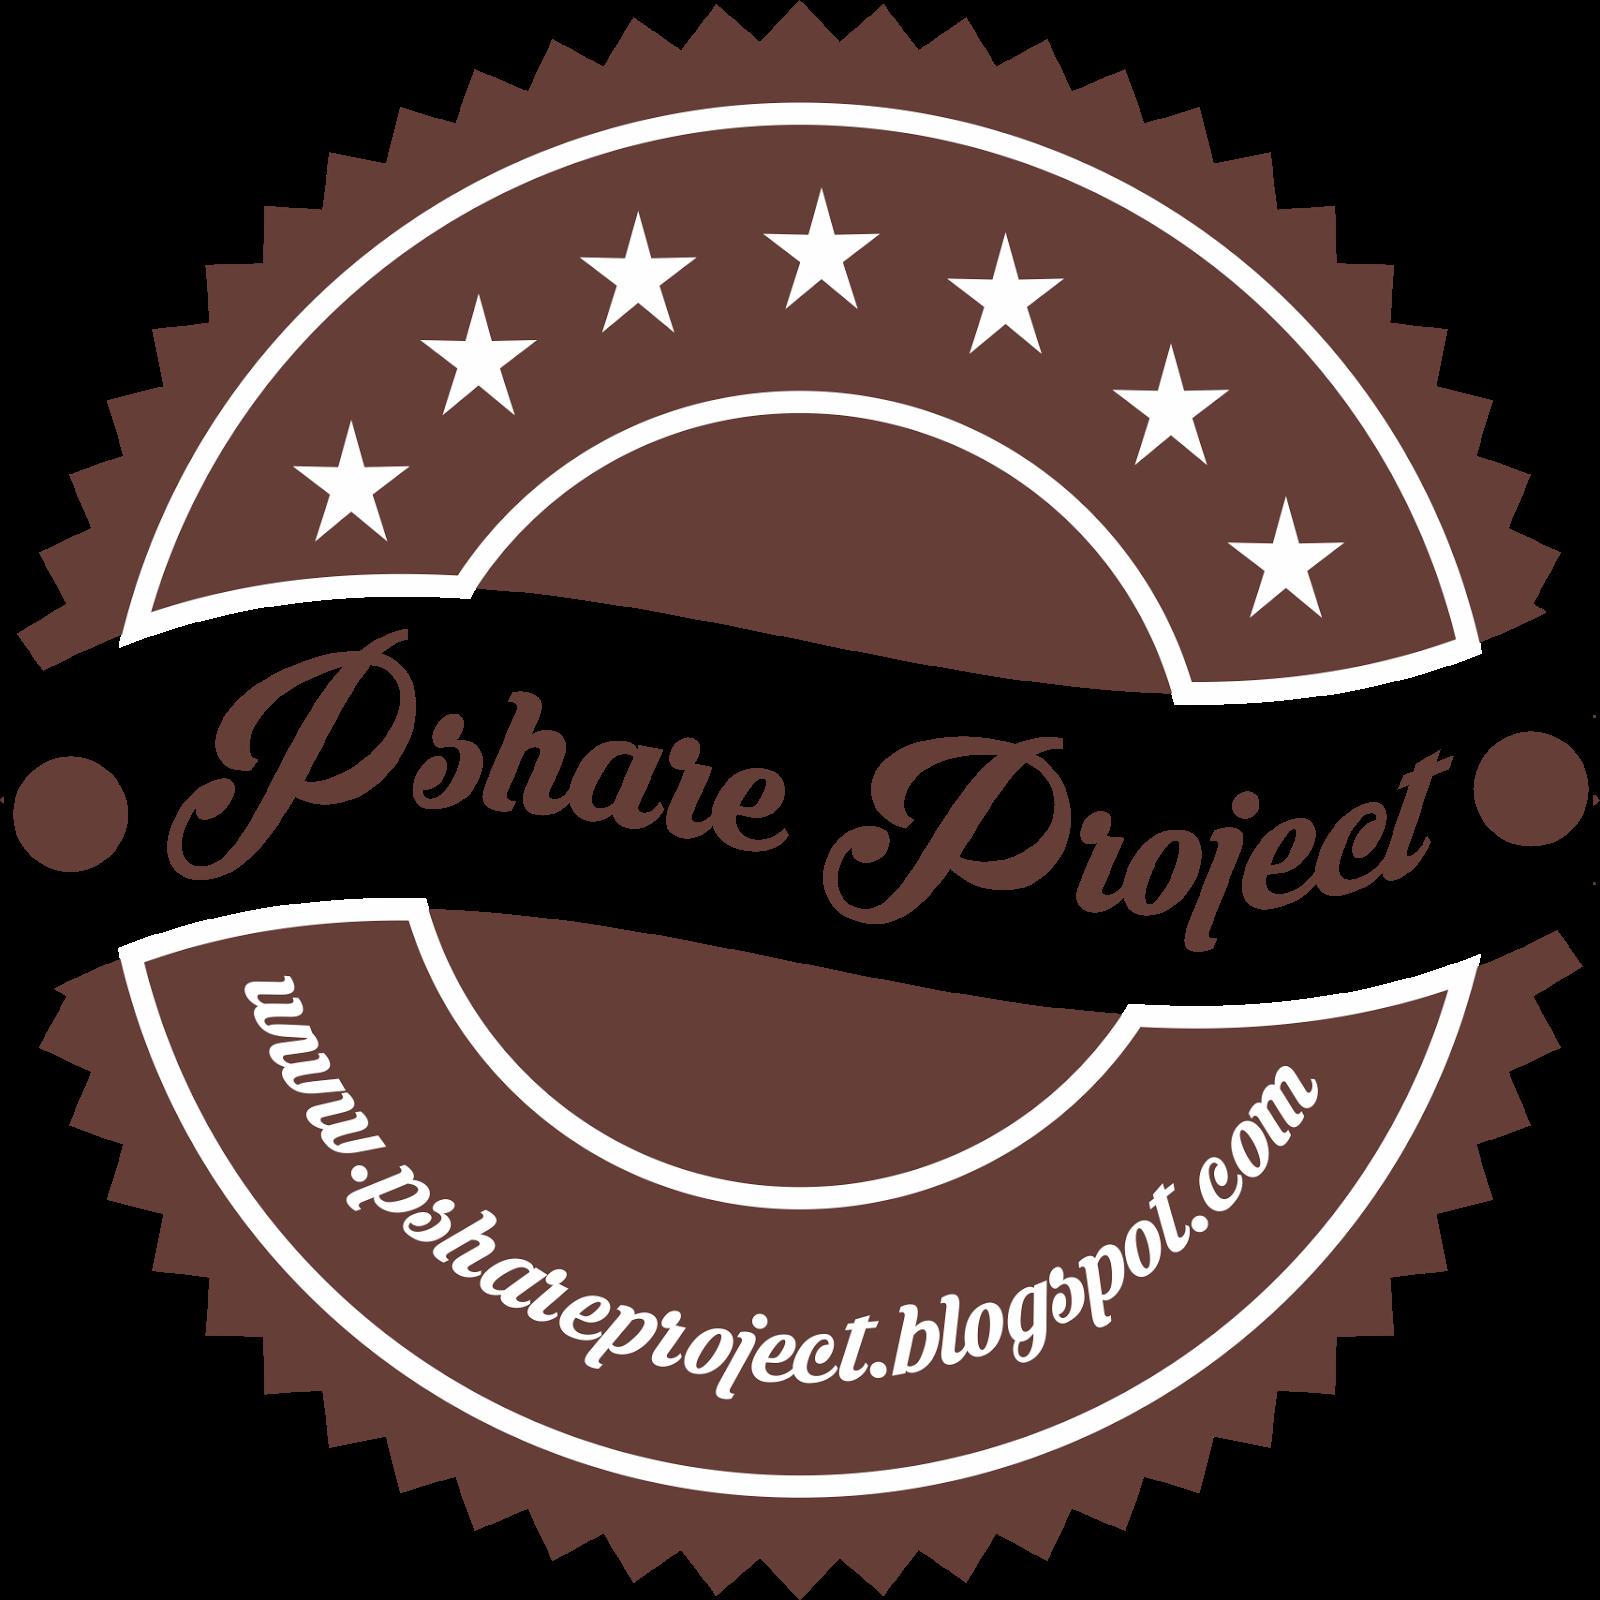 Tutorial membuat Logo Bergaya Vintage menggunakan Corel Draw | Pshare Project